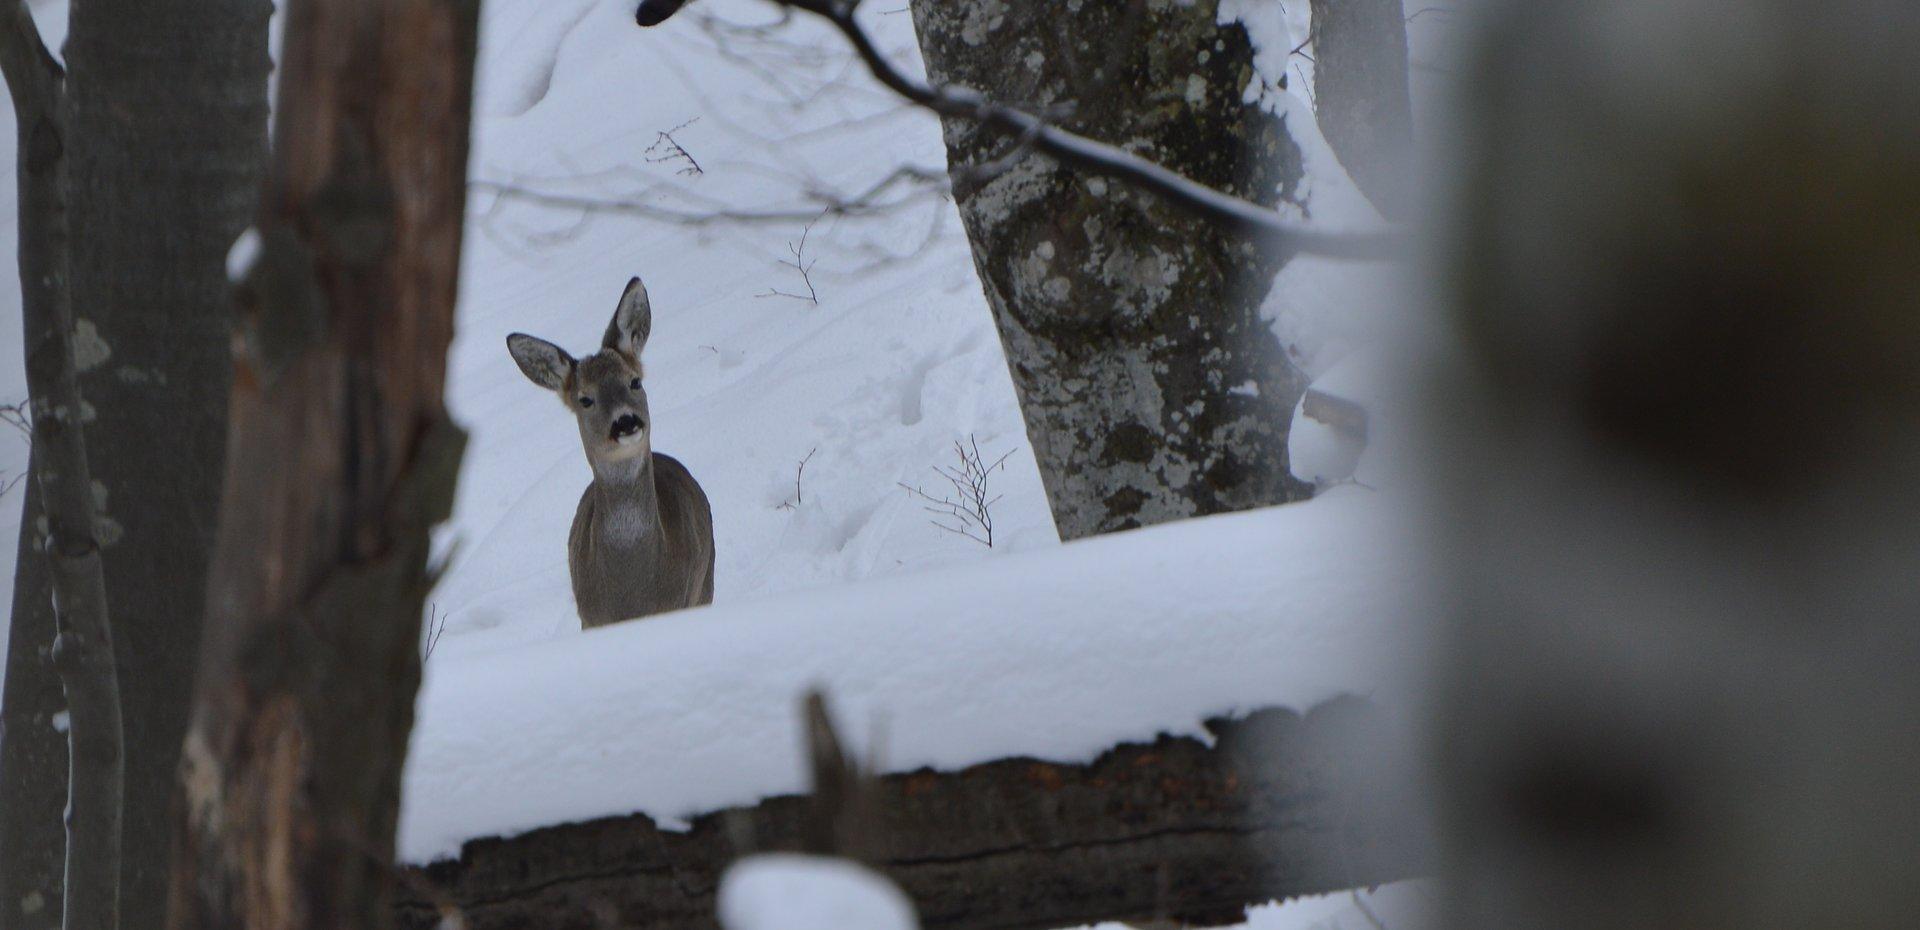 Photo in Wild life | Author rogath | PHOTO FORUM